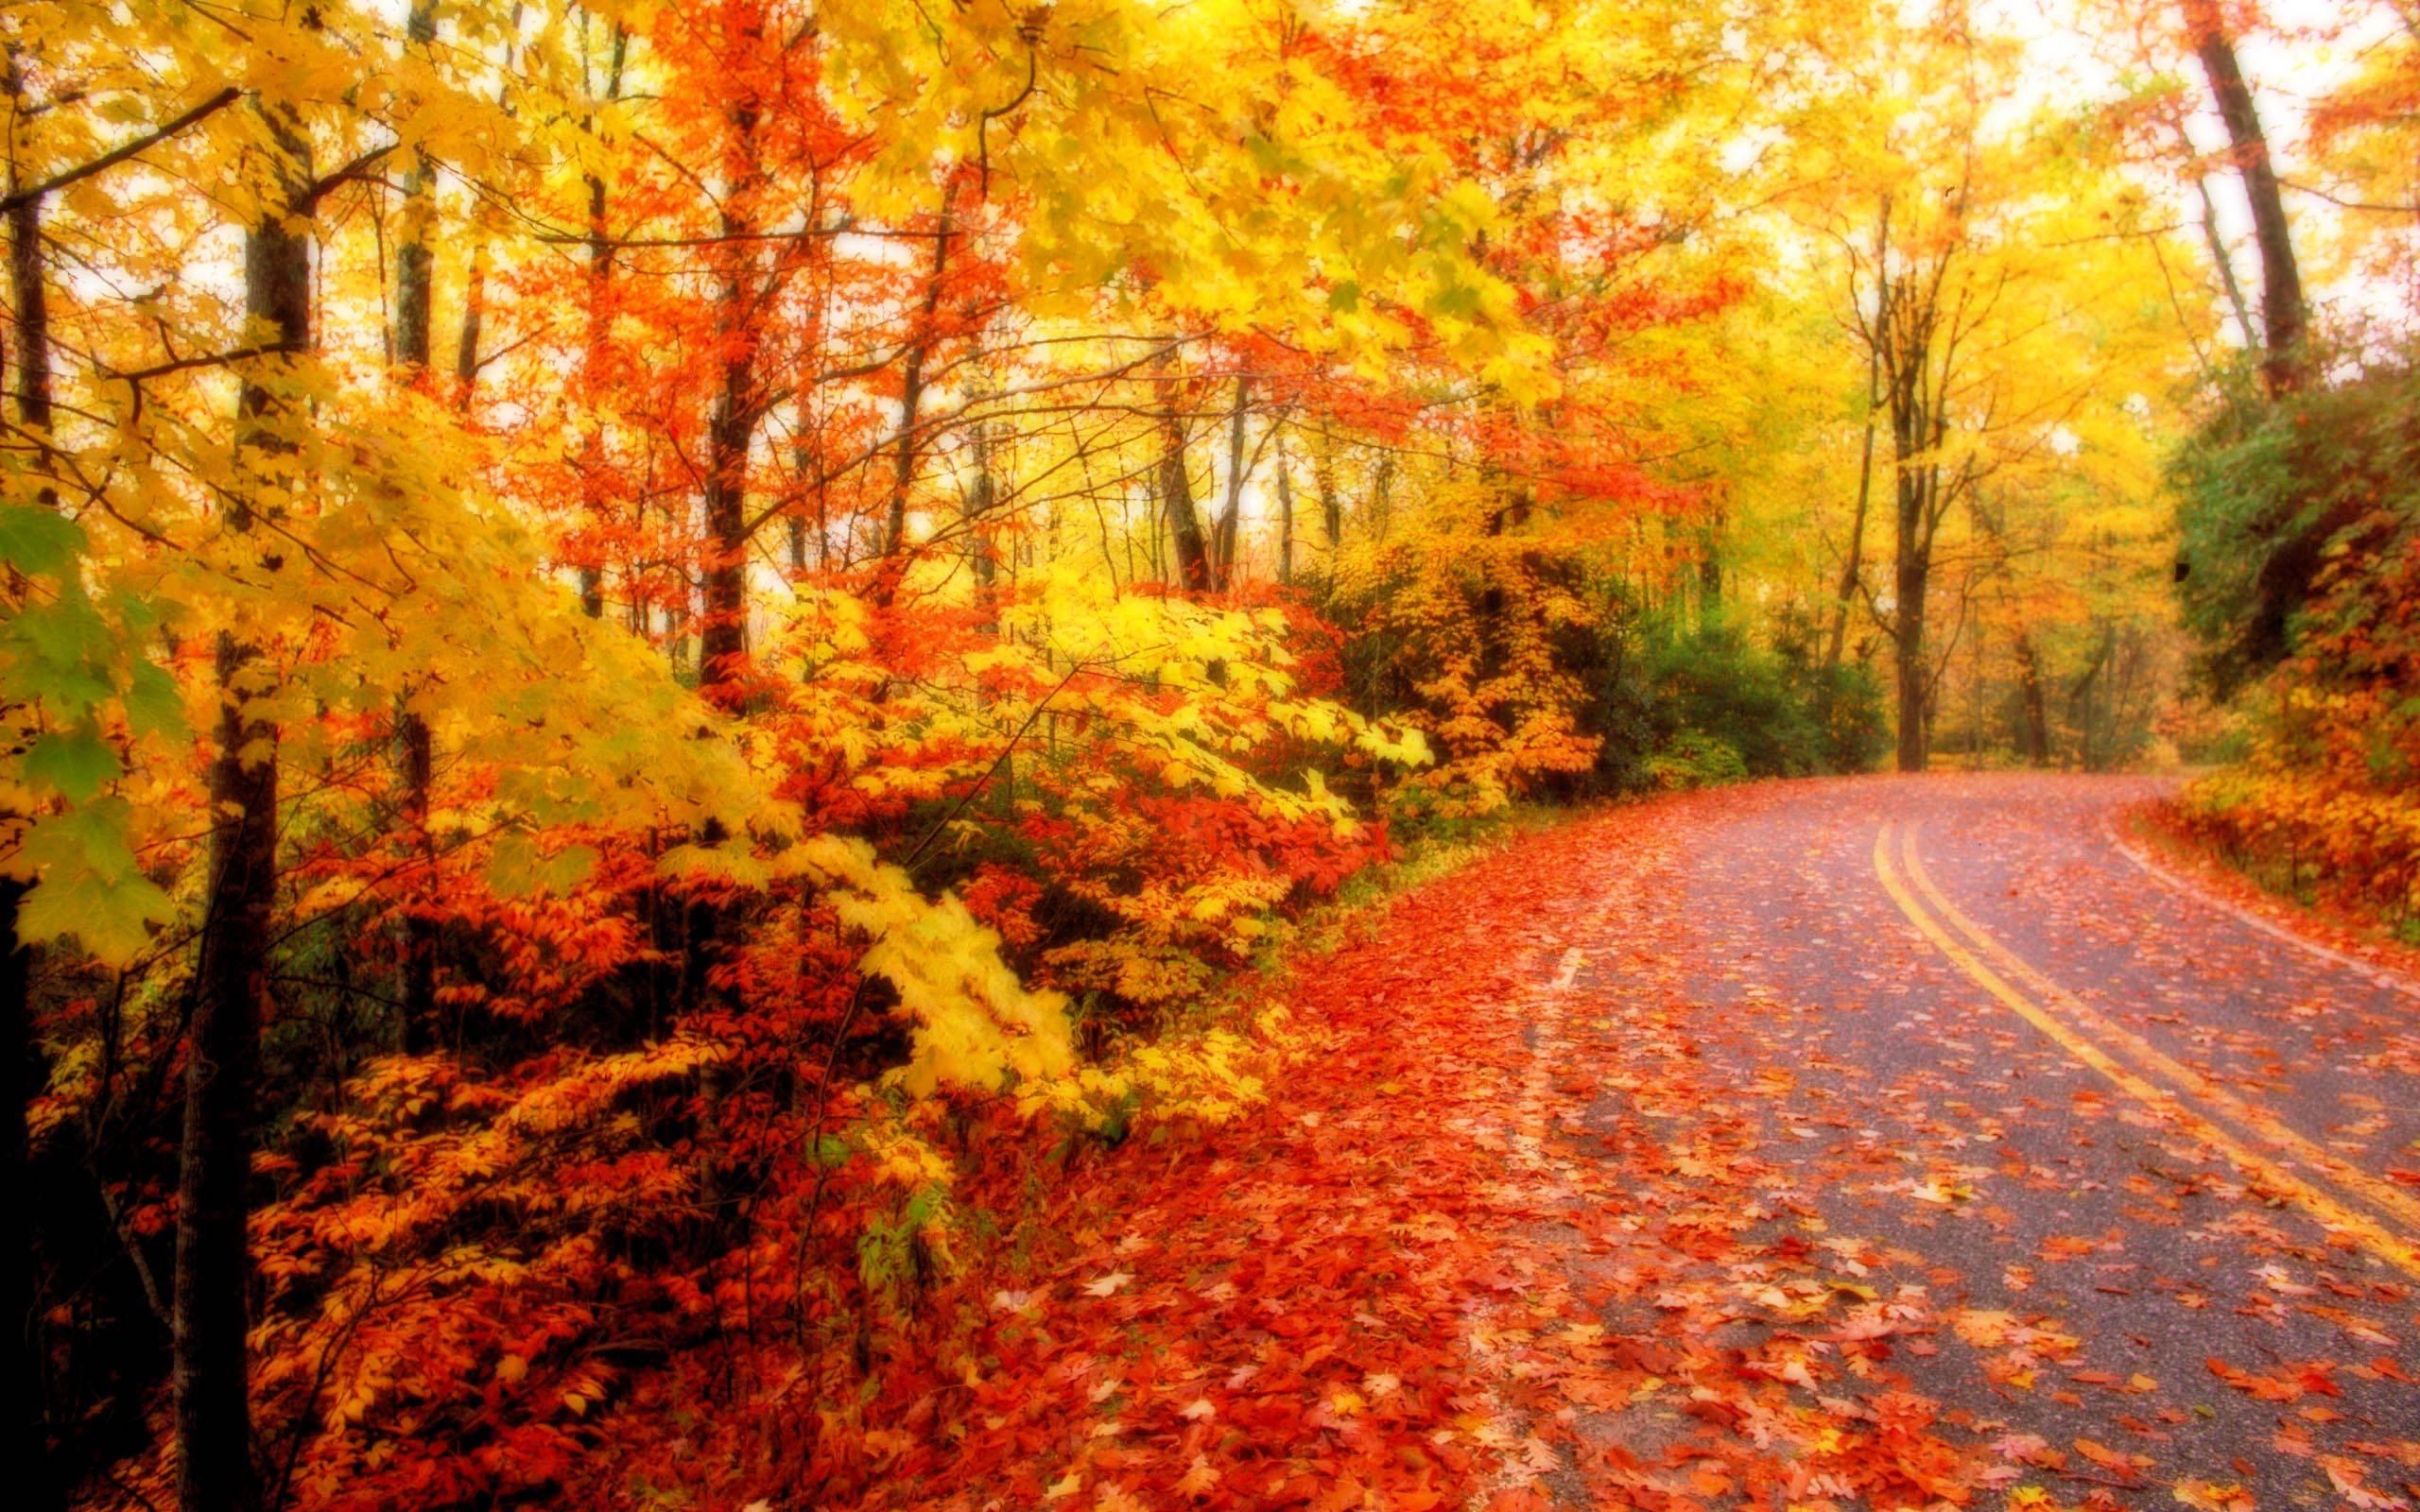 Autumn Pictures For Desktop Backgrounds - Wallpaper Cave